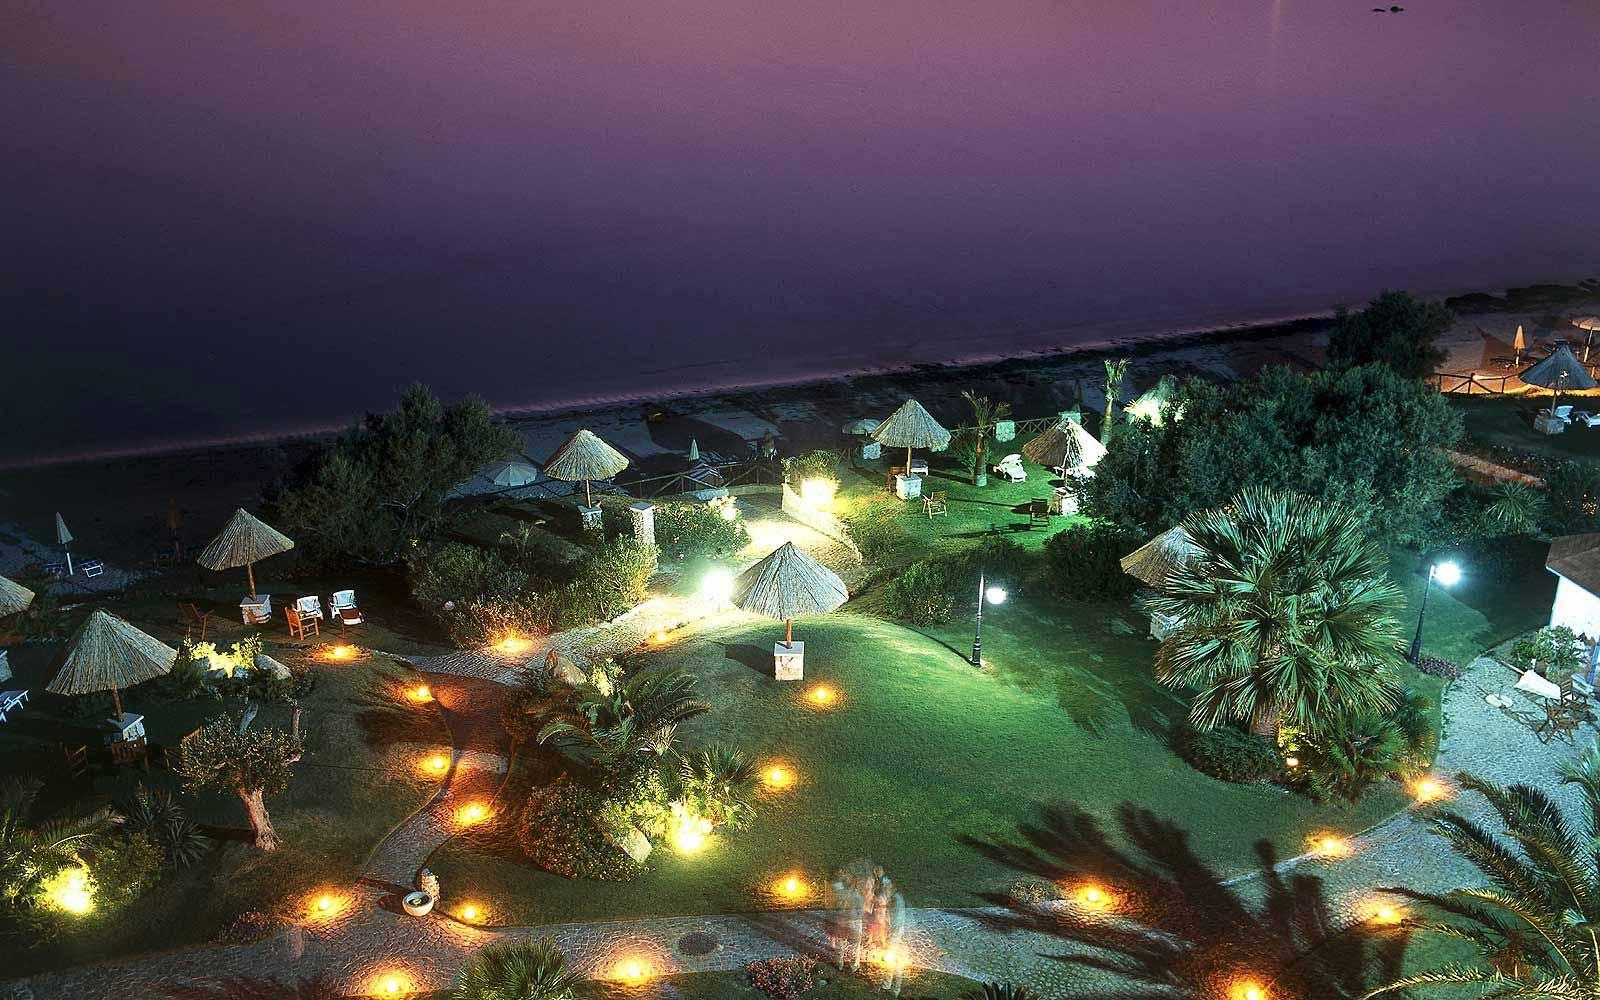 Hotel Stella Maris' gardens at night